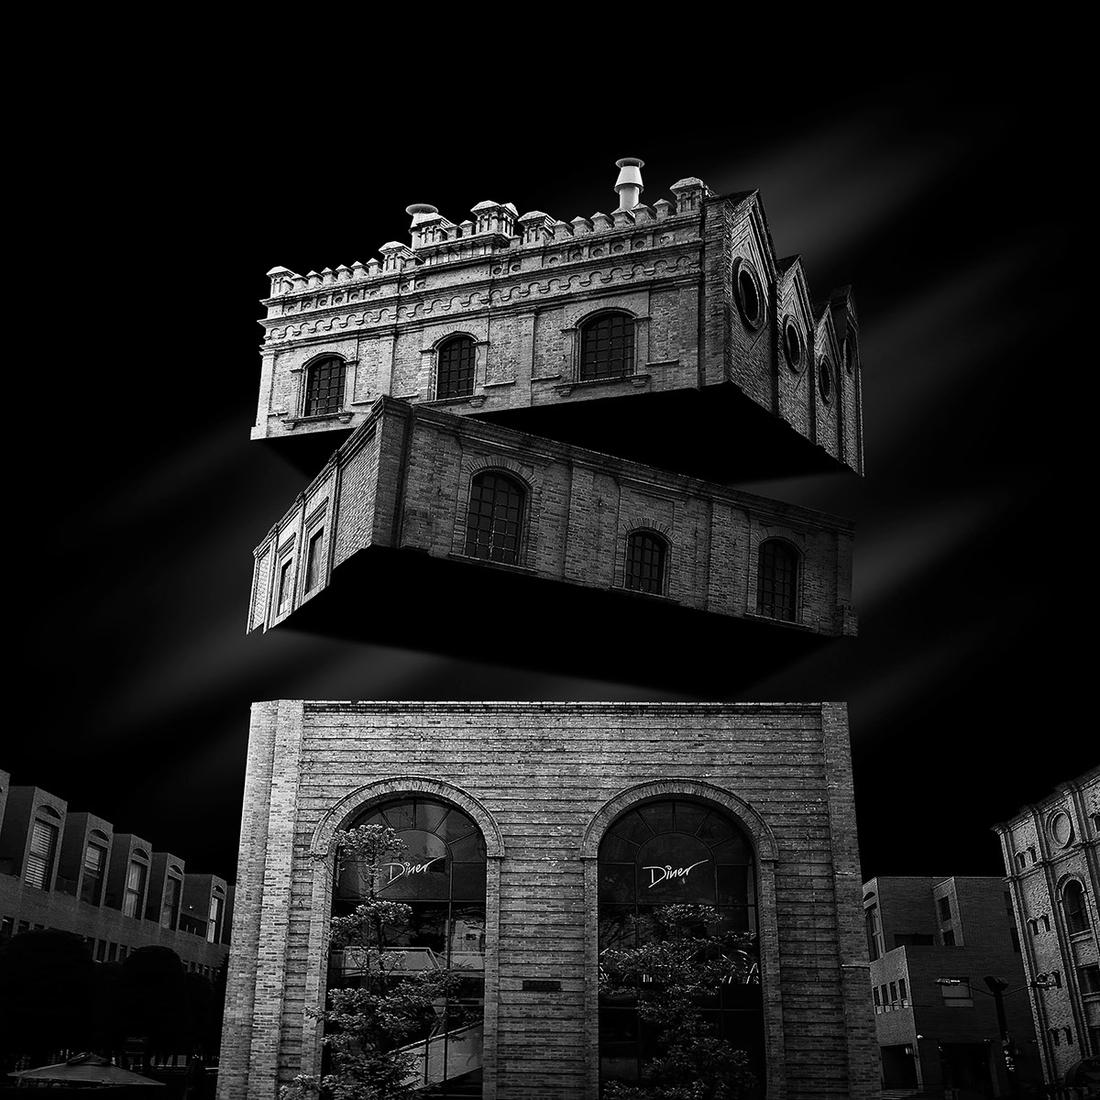 04-Daniel-Garay-Arango-Black-and-White-Surreal-Photographs-Architectural-Deconstruction-www-designstack-co